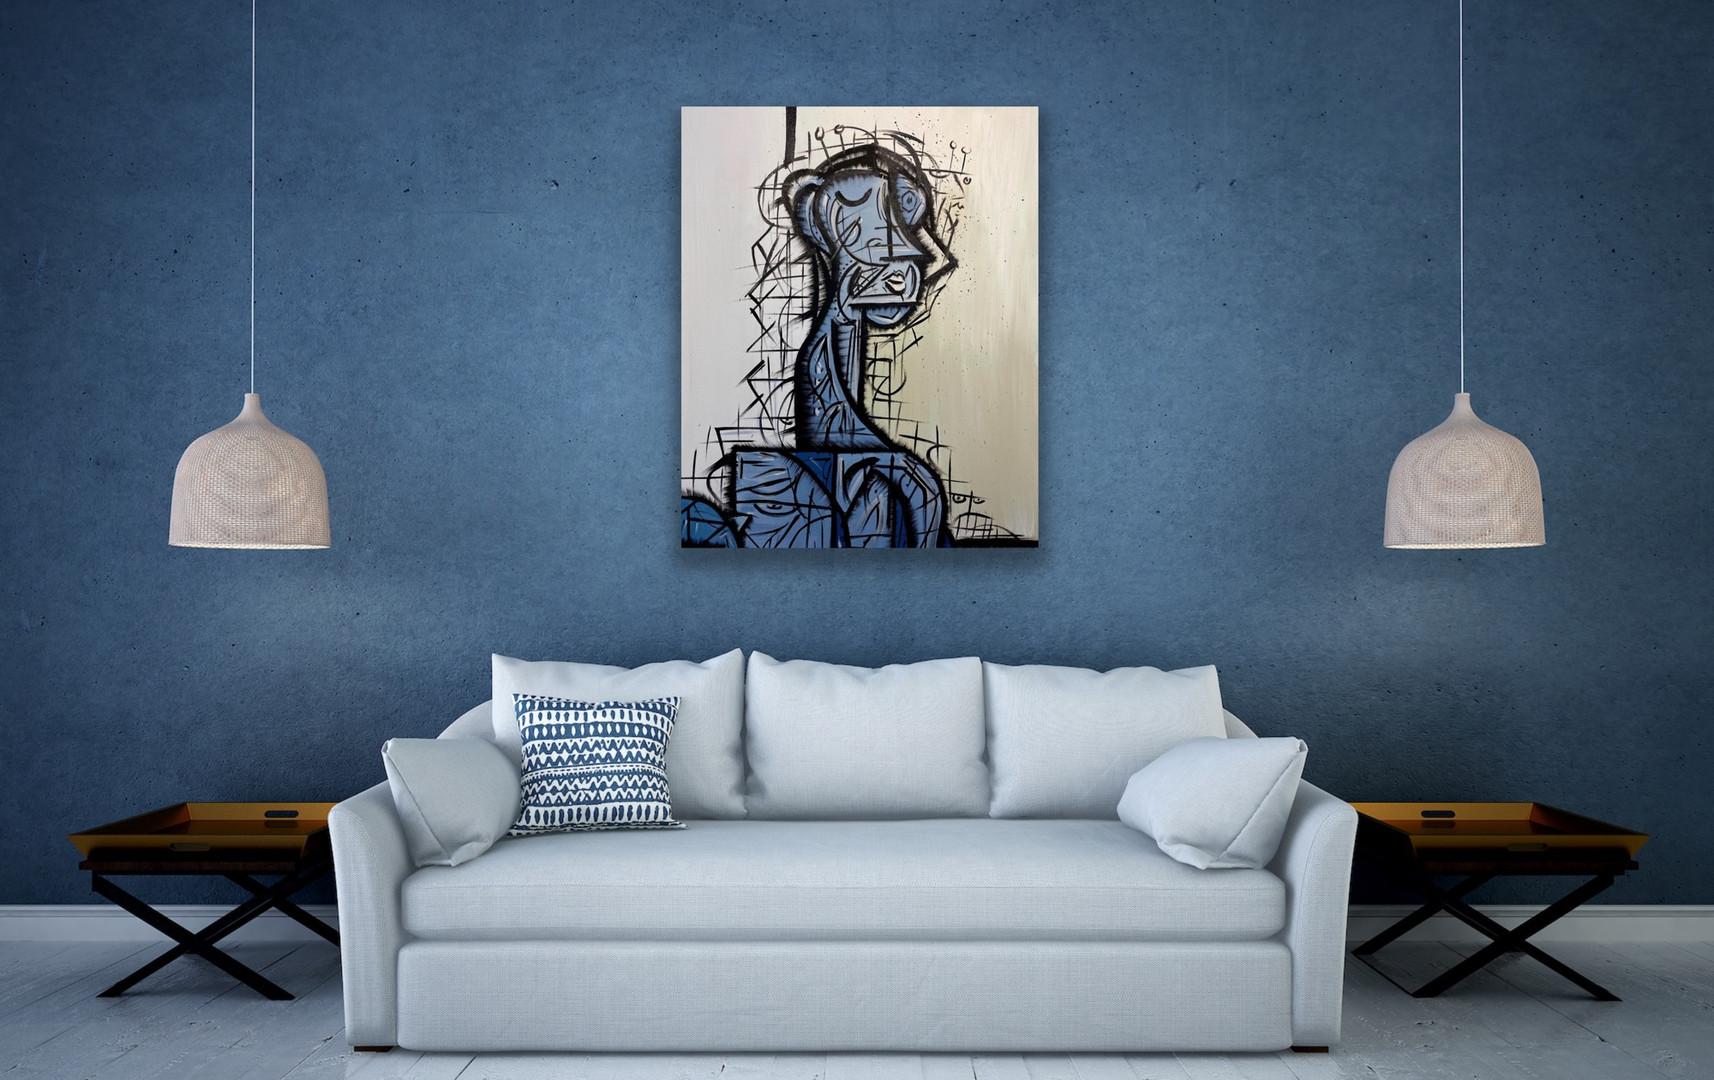 Alien Queen (On the Wall)